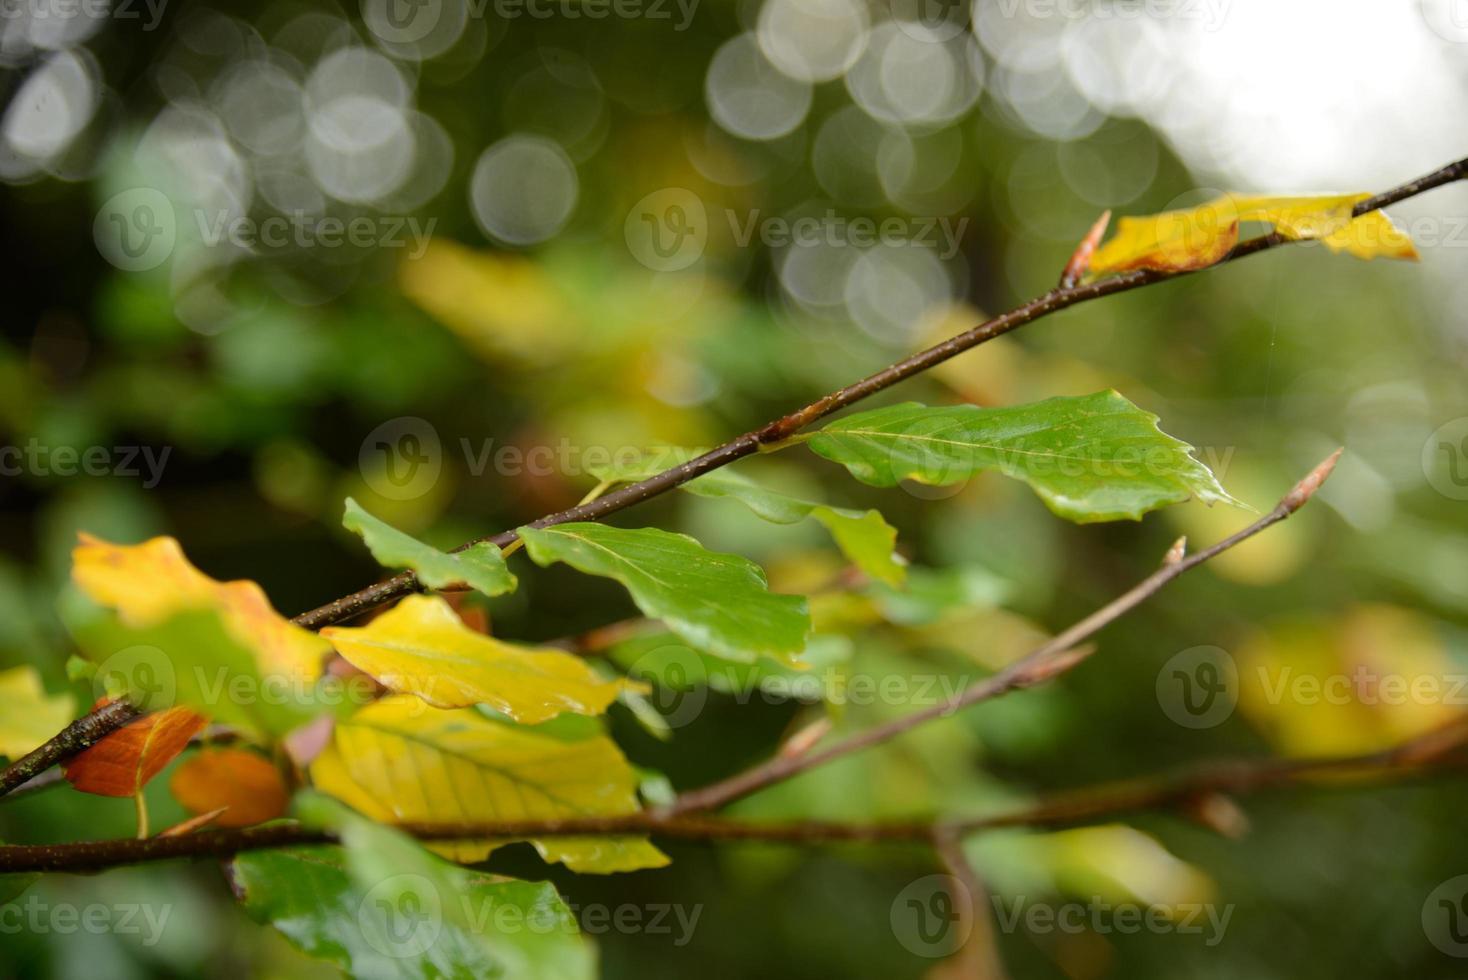 l'automne approche photo